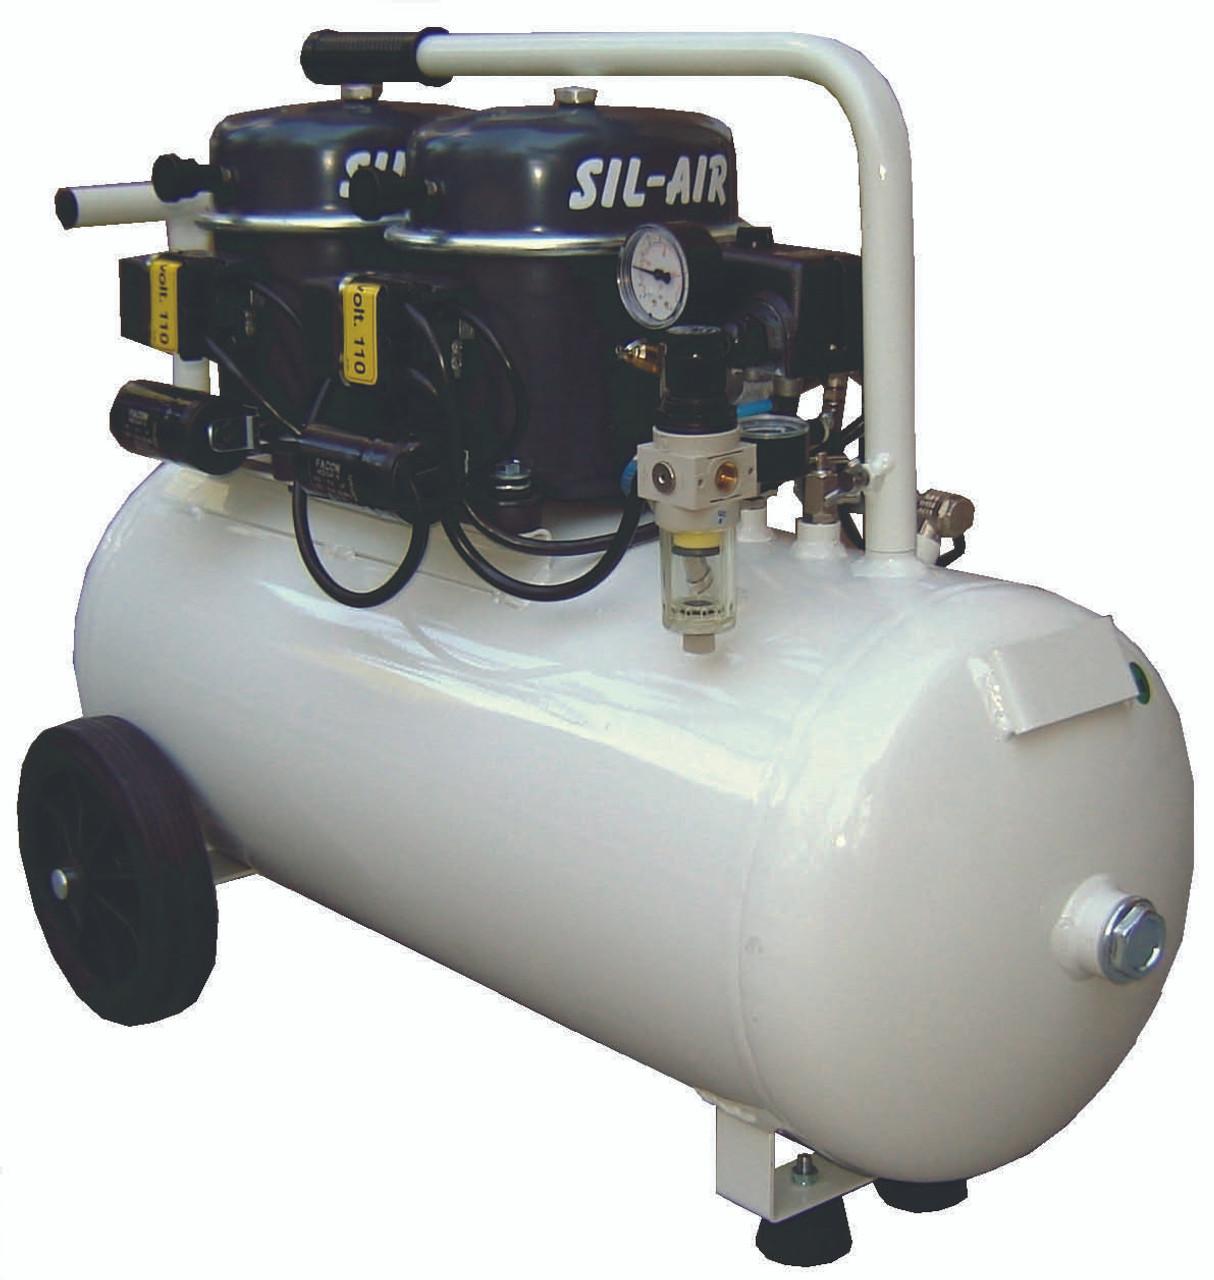 Sil-Air 100-50 2 x 1/2 HP Single Phase 13 Gallon Silent Air Compressor by Silentaire Technologies